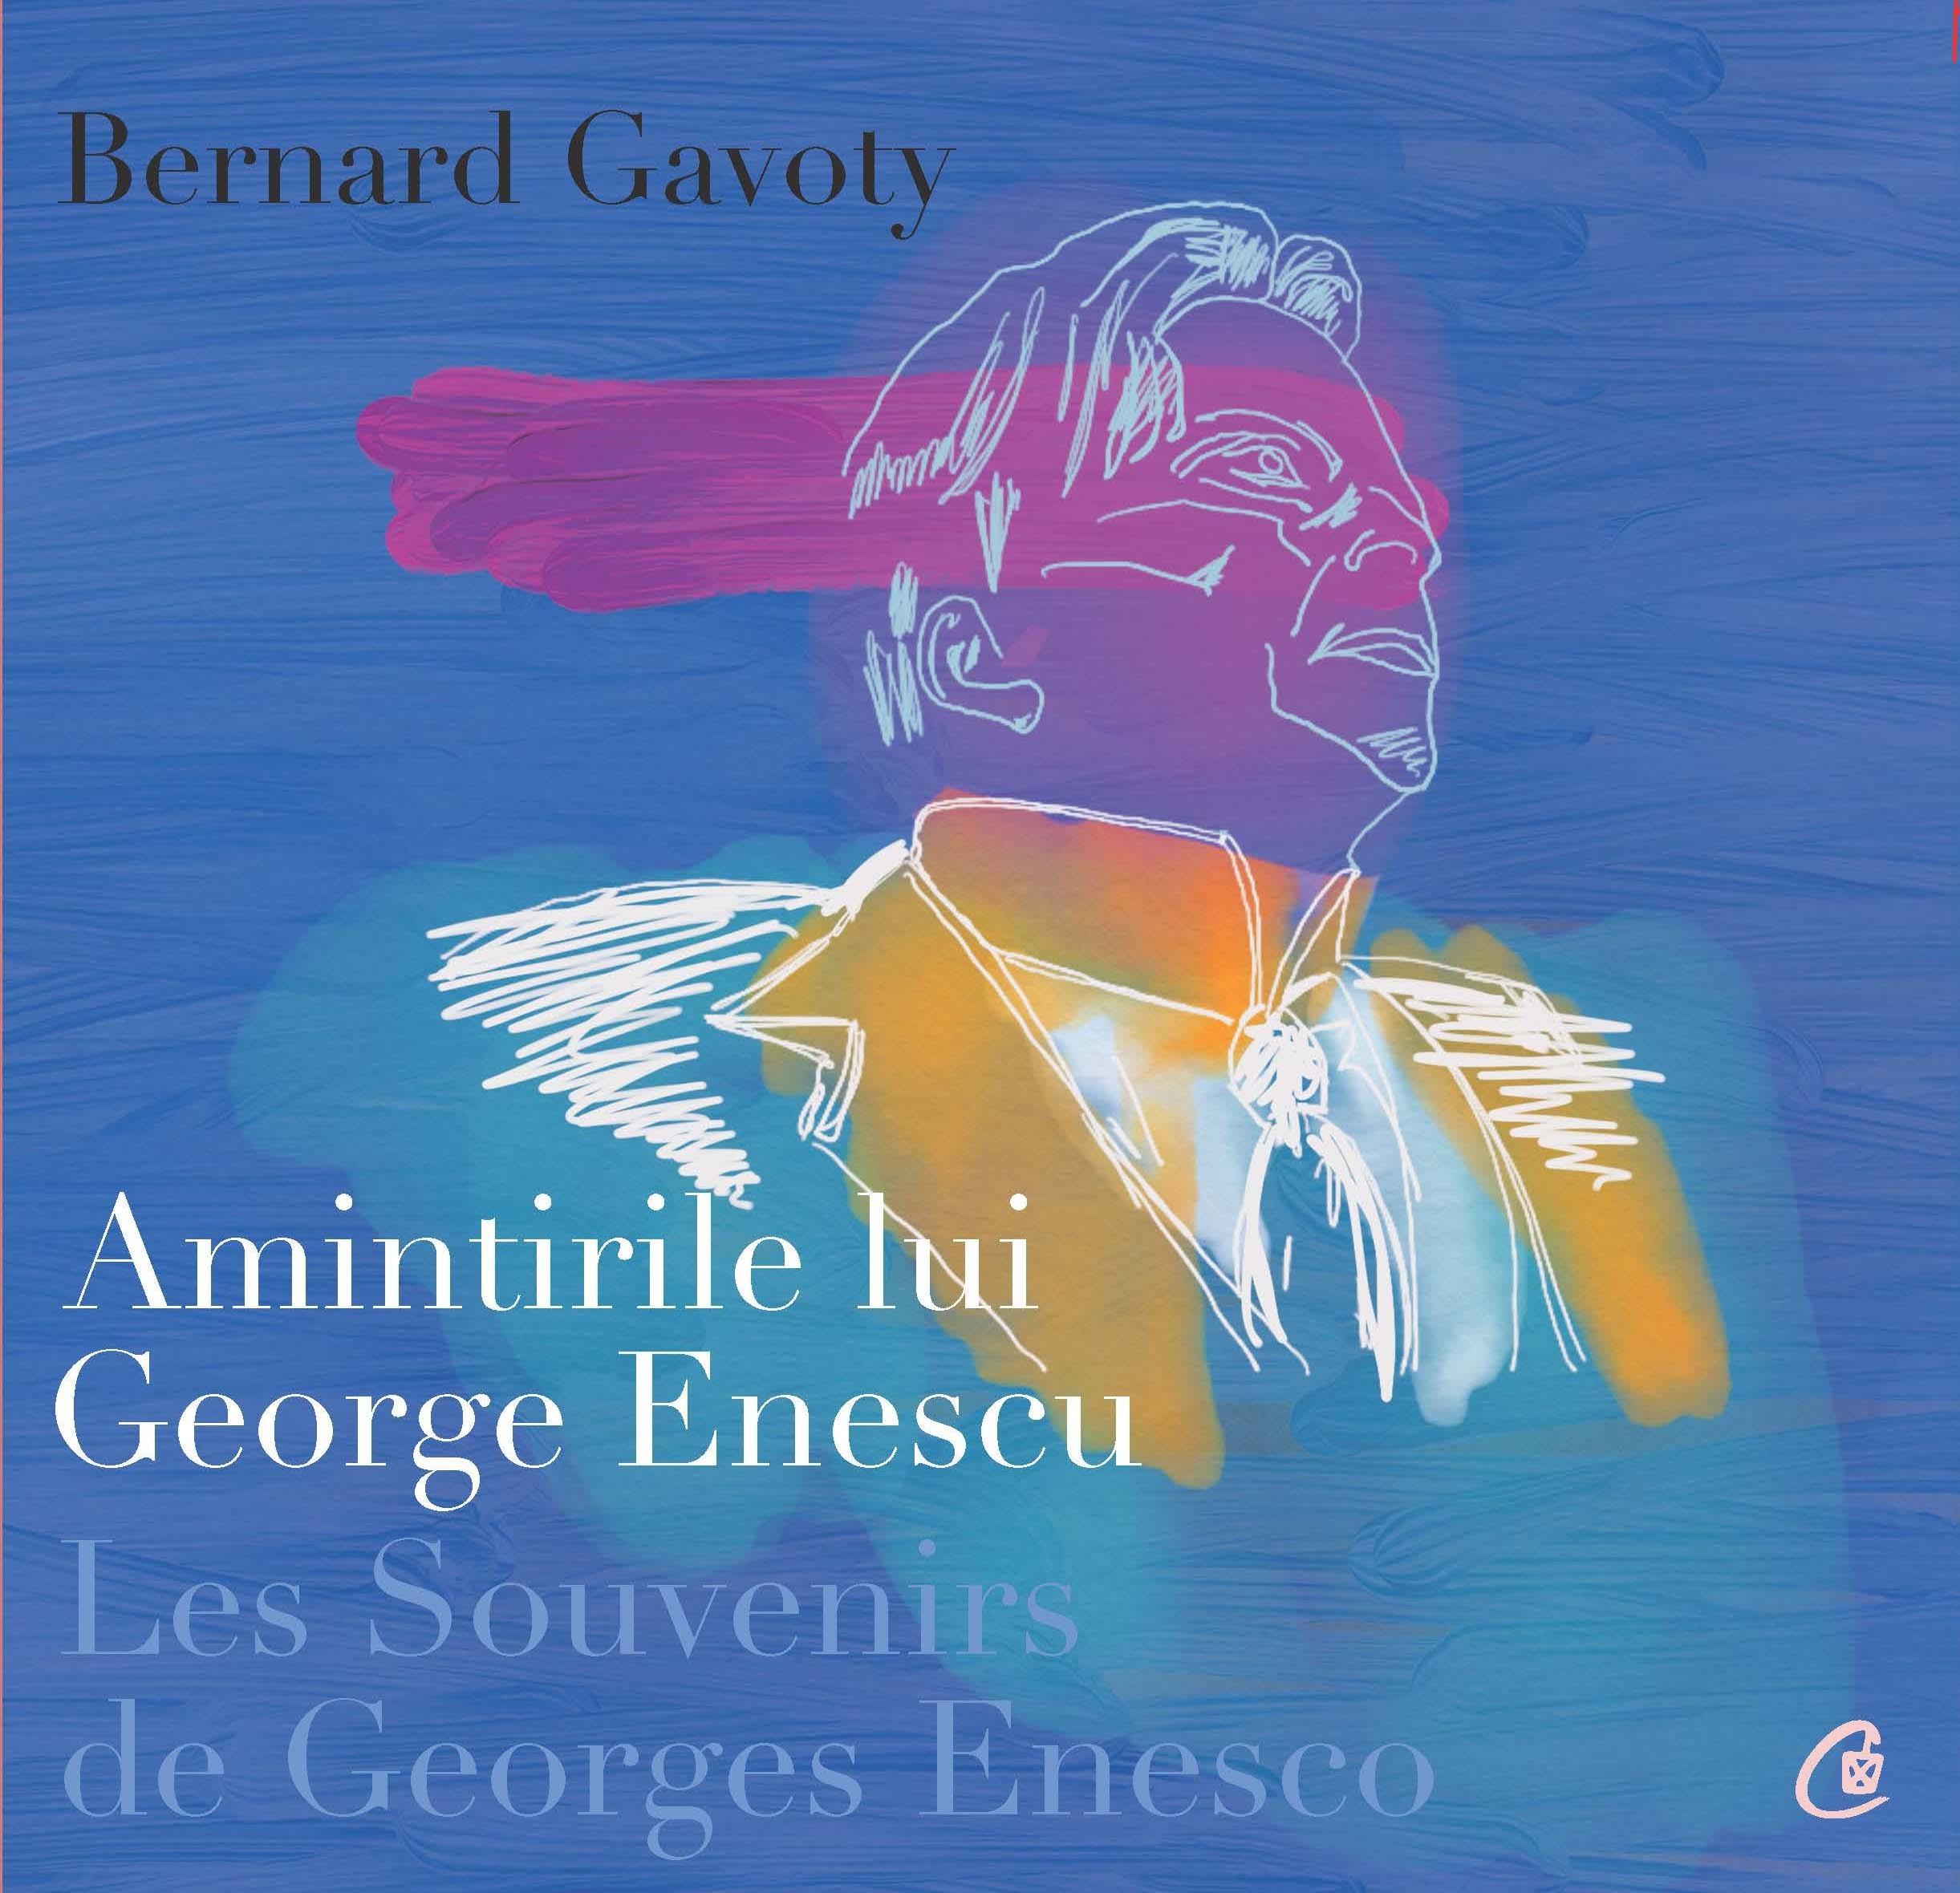 Amintirile lui George Enescu / Les Souvenirs de Georges Enesco | Bernard Gavoty